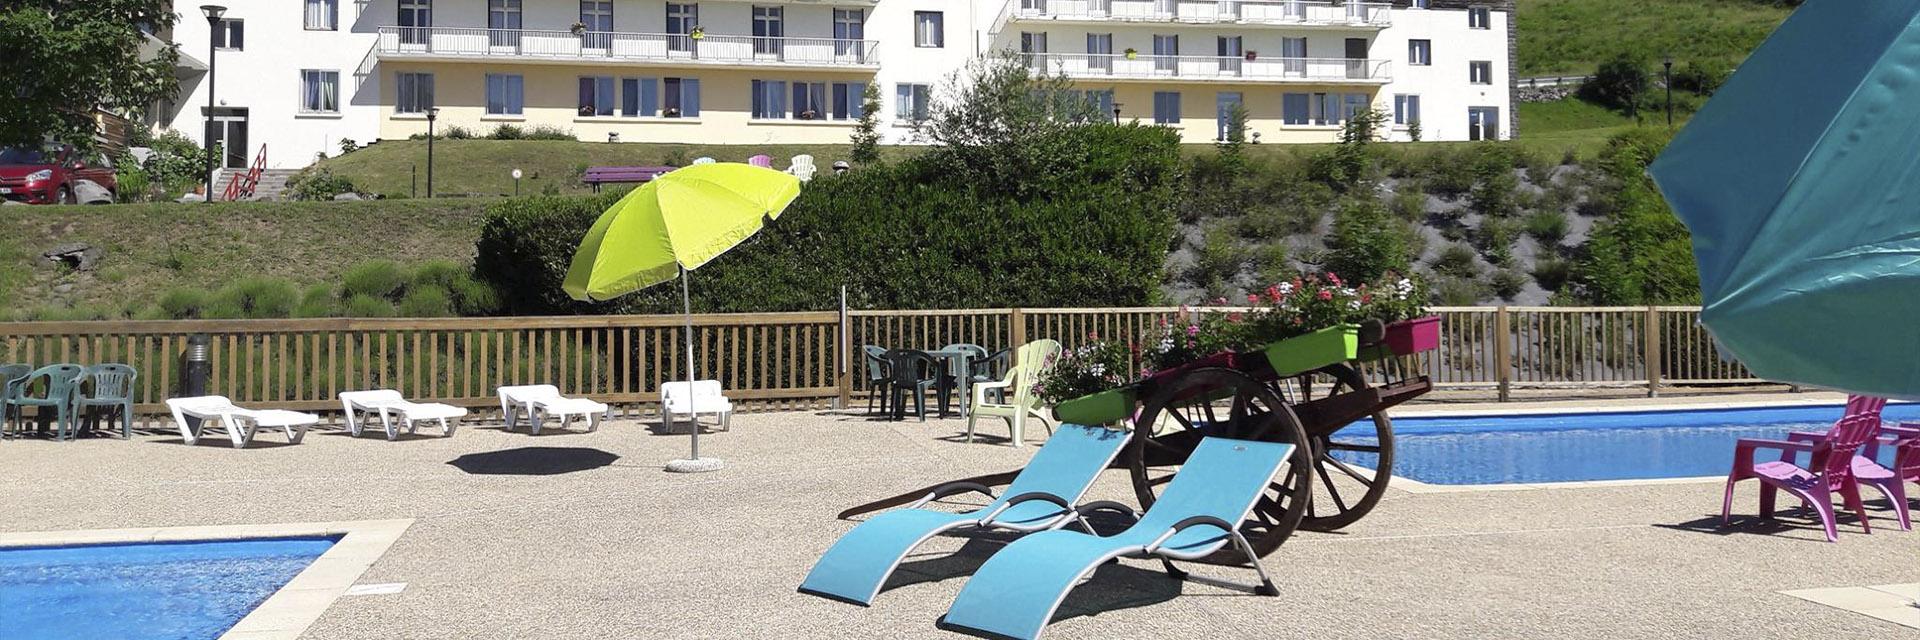 village-vacance-fleurs-d-aubrac-piscine-residence